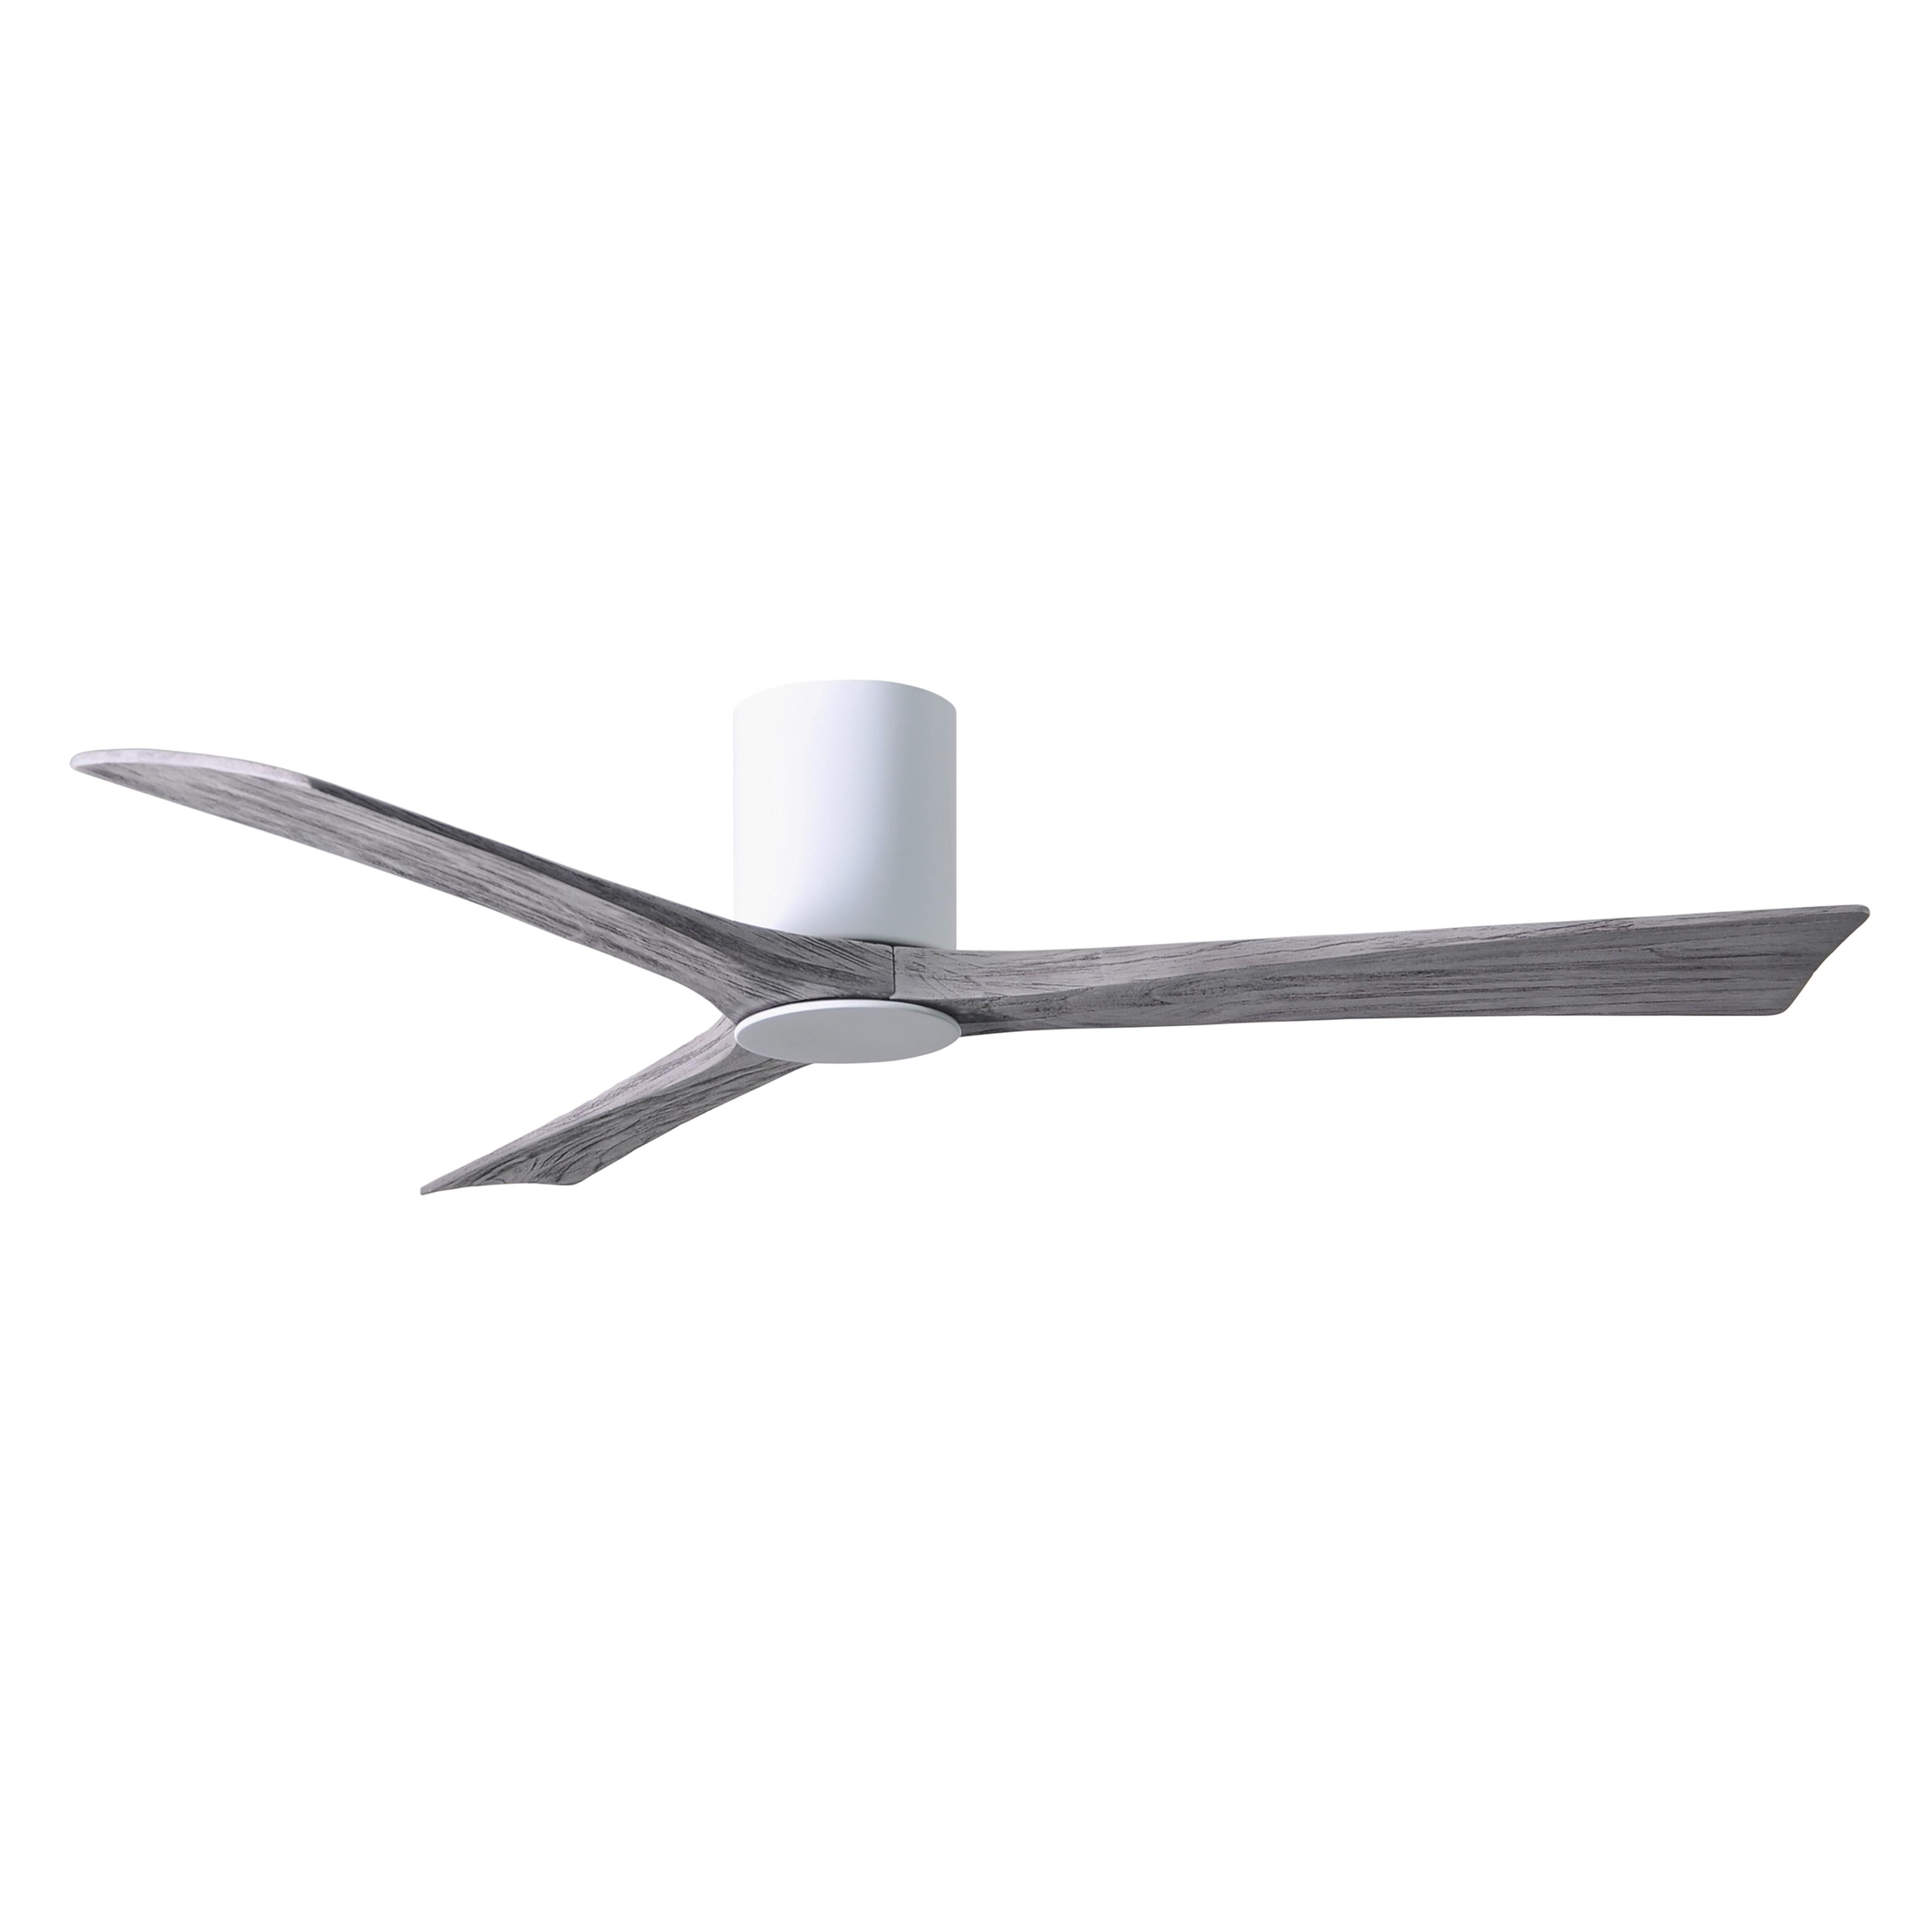 Shop Irene Hlk 3 Blade 60 Inch Gloss White Flushmount Paddle Fan With Light Kit Barn Wood Tone Blades Overstock 27551054